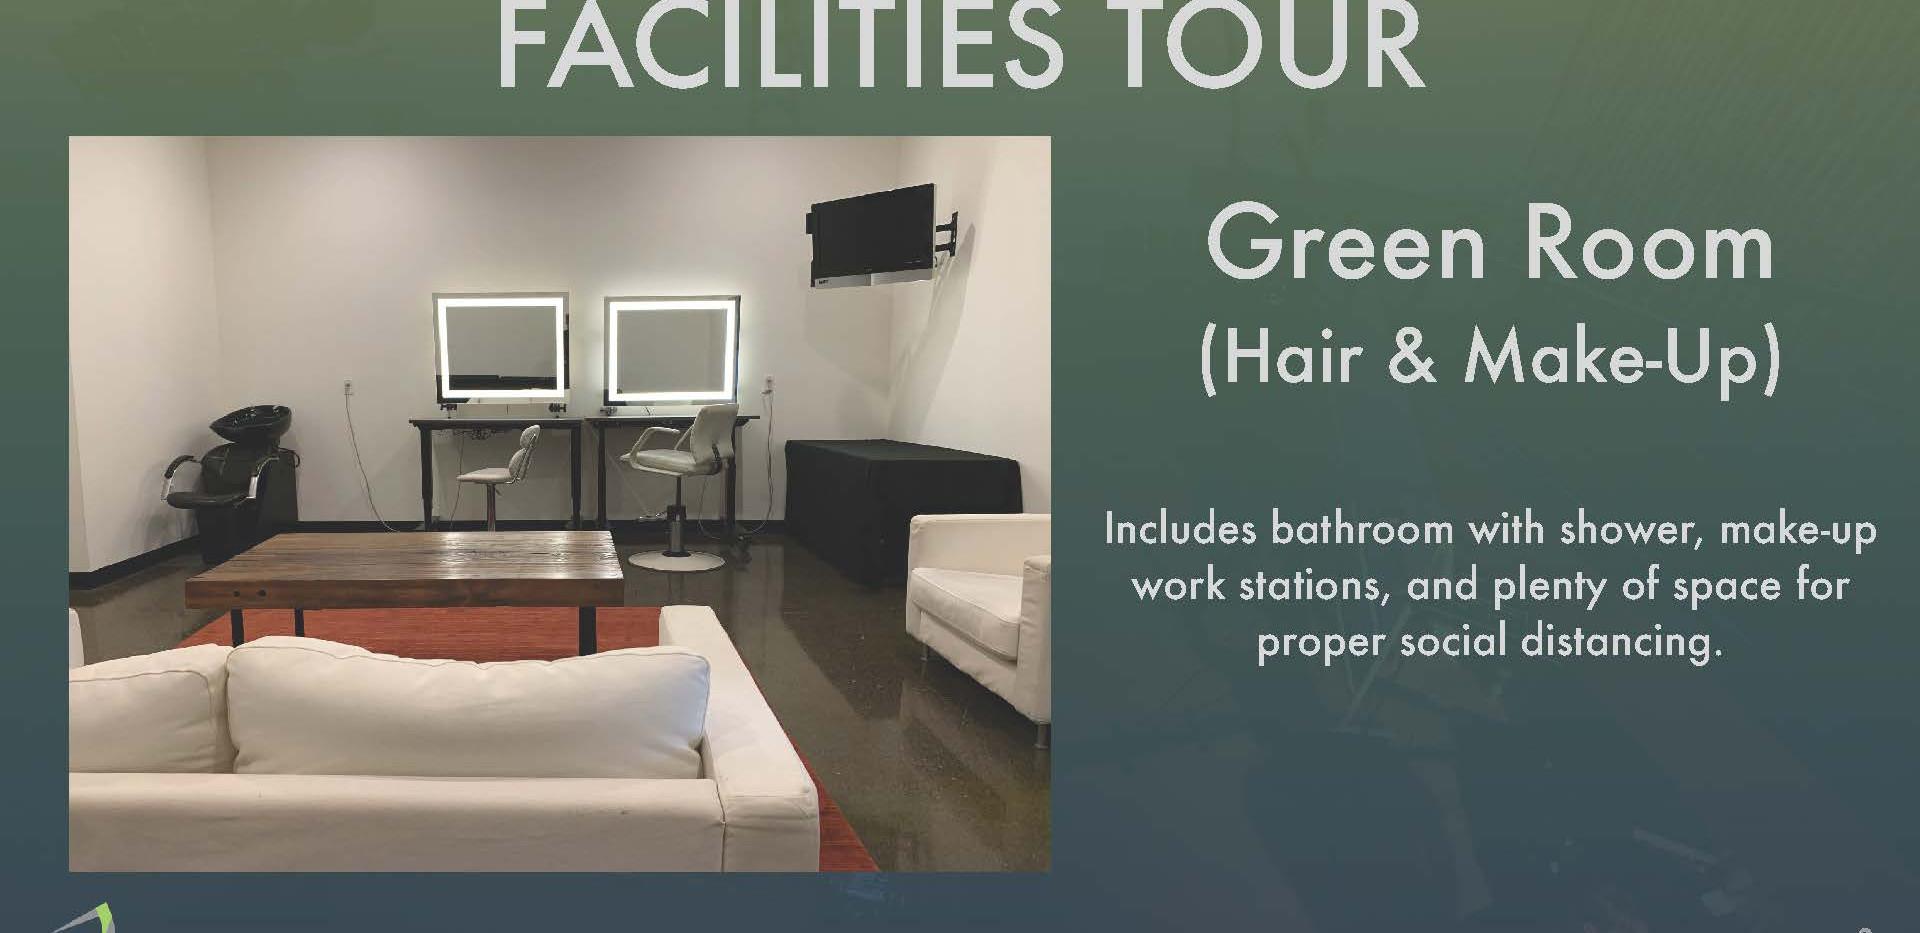 Facilites Tour - Green Room